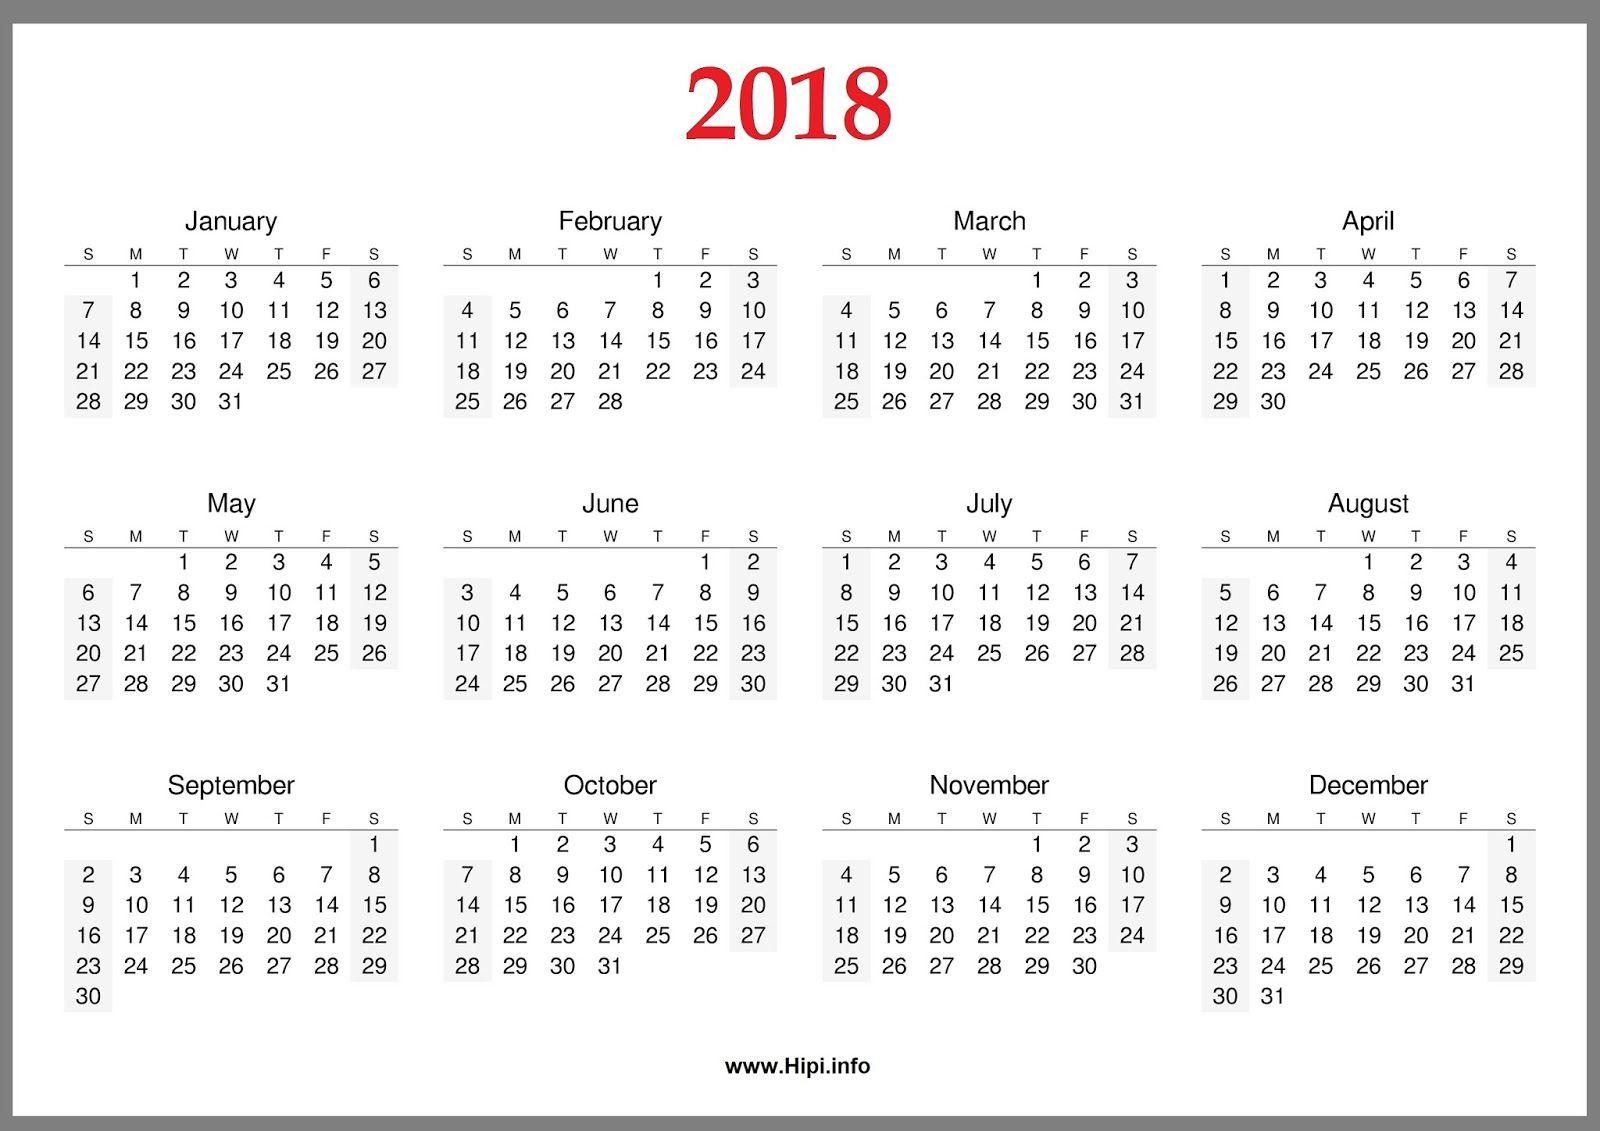 2018 Calendar Wallpapers Wallpaper Cave